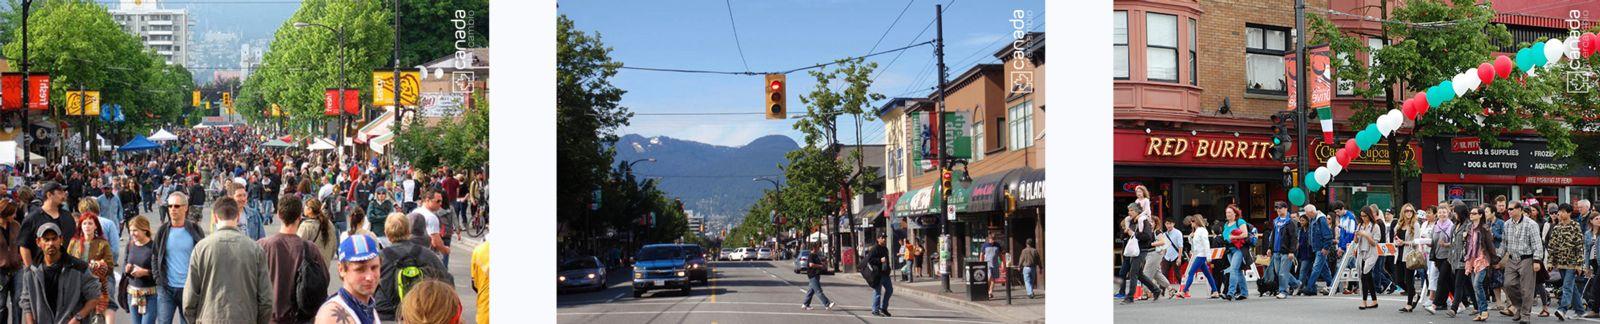 area turistica em vancouver-commercial drive